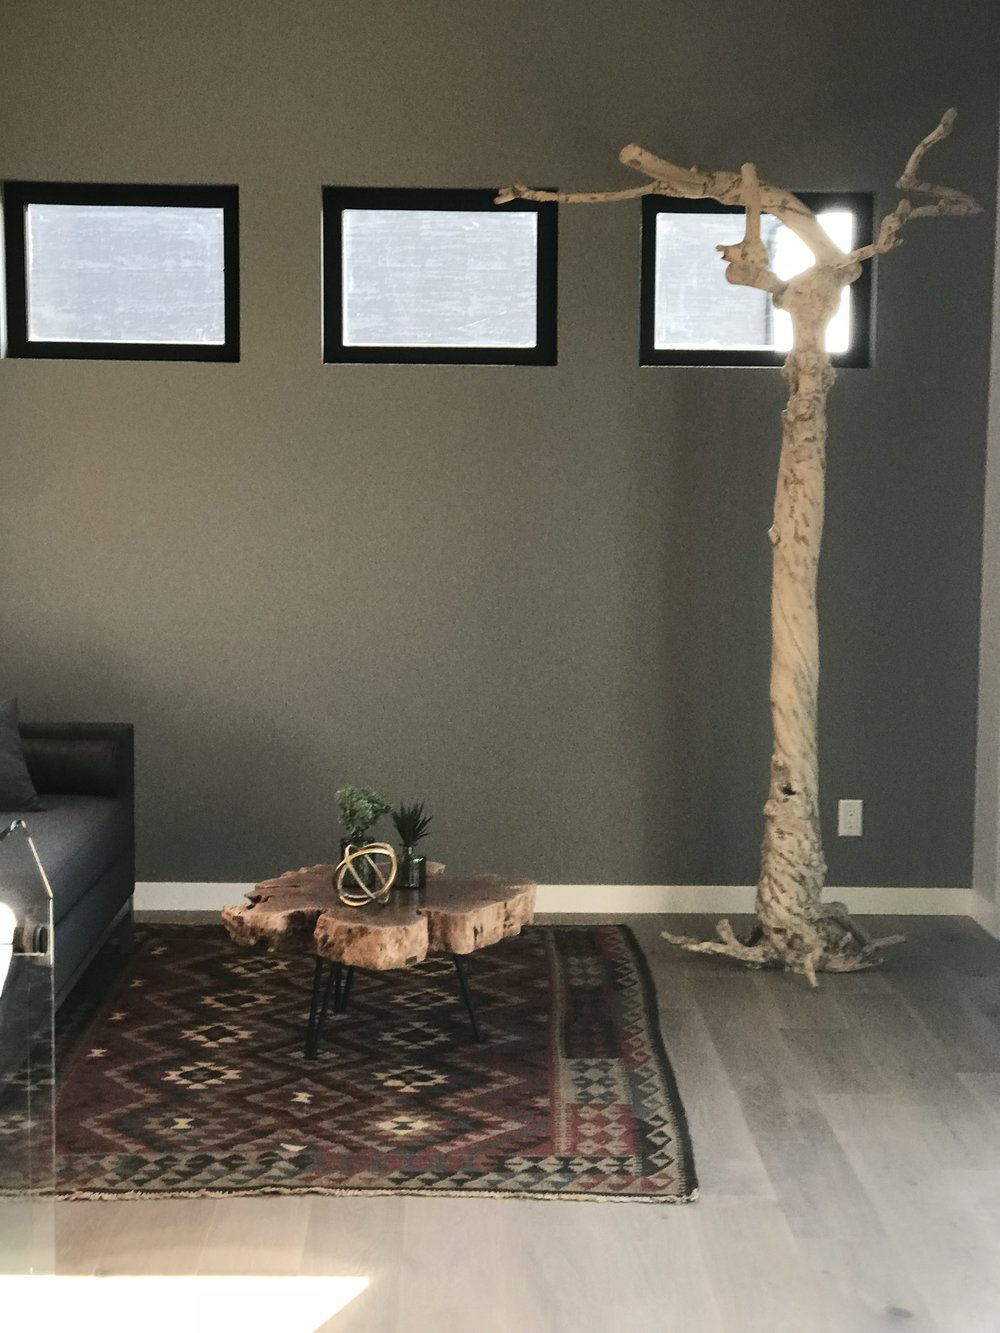 huntington homes show home furniture. blue moon furniture. coffee tree home decor.JPG